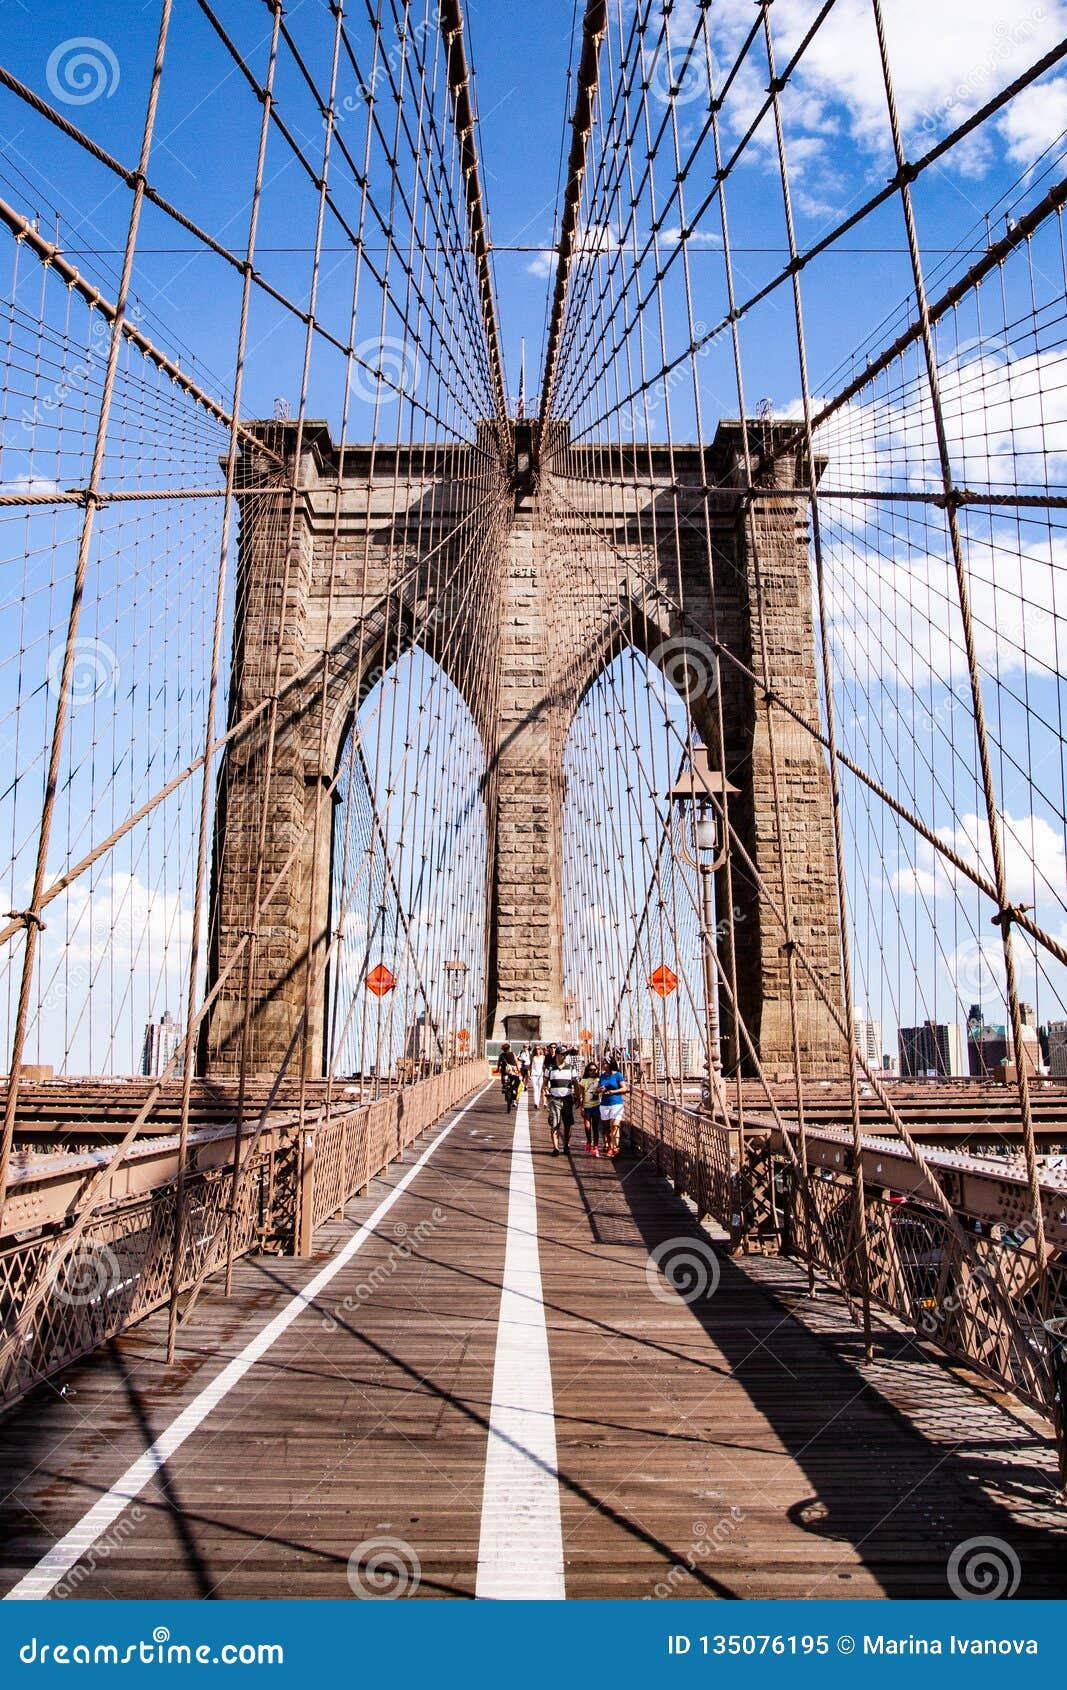 View of the Brooklyn Bridge, NYC, USA